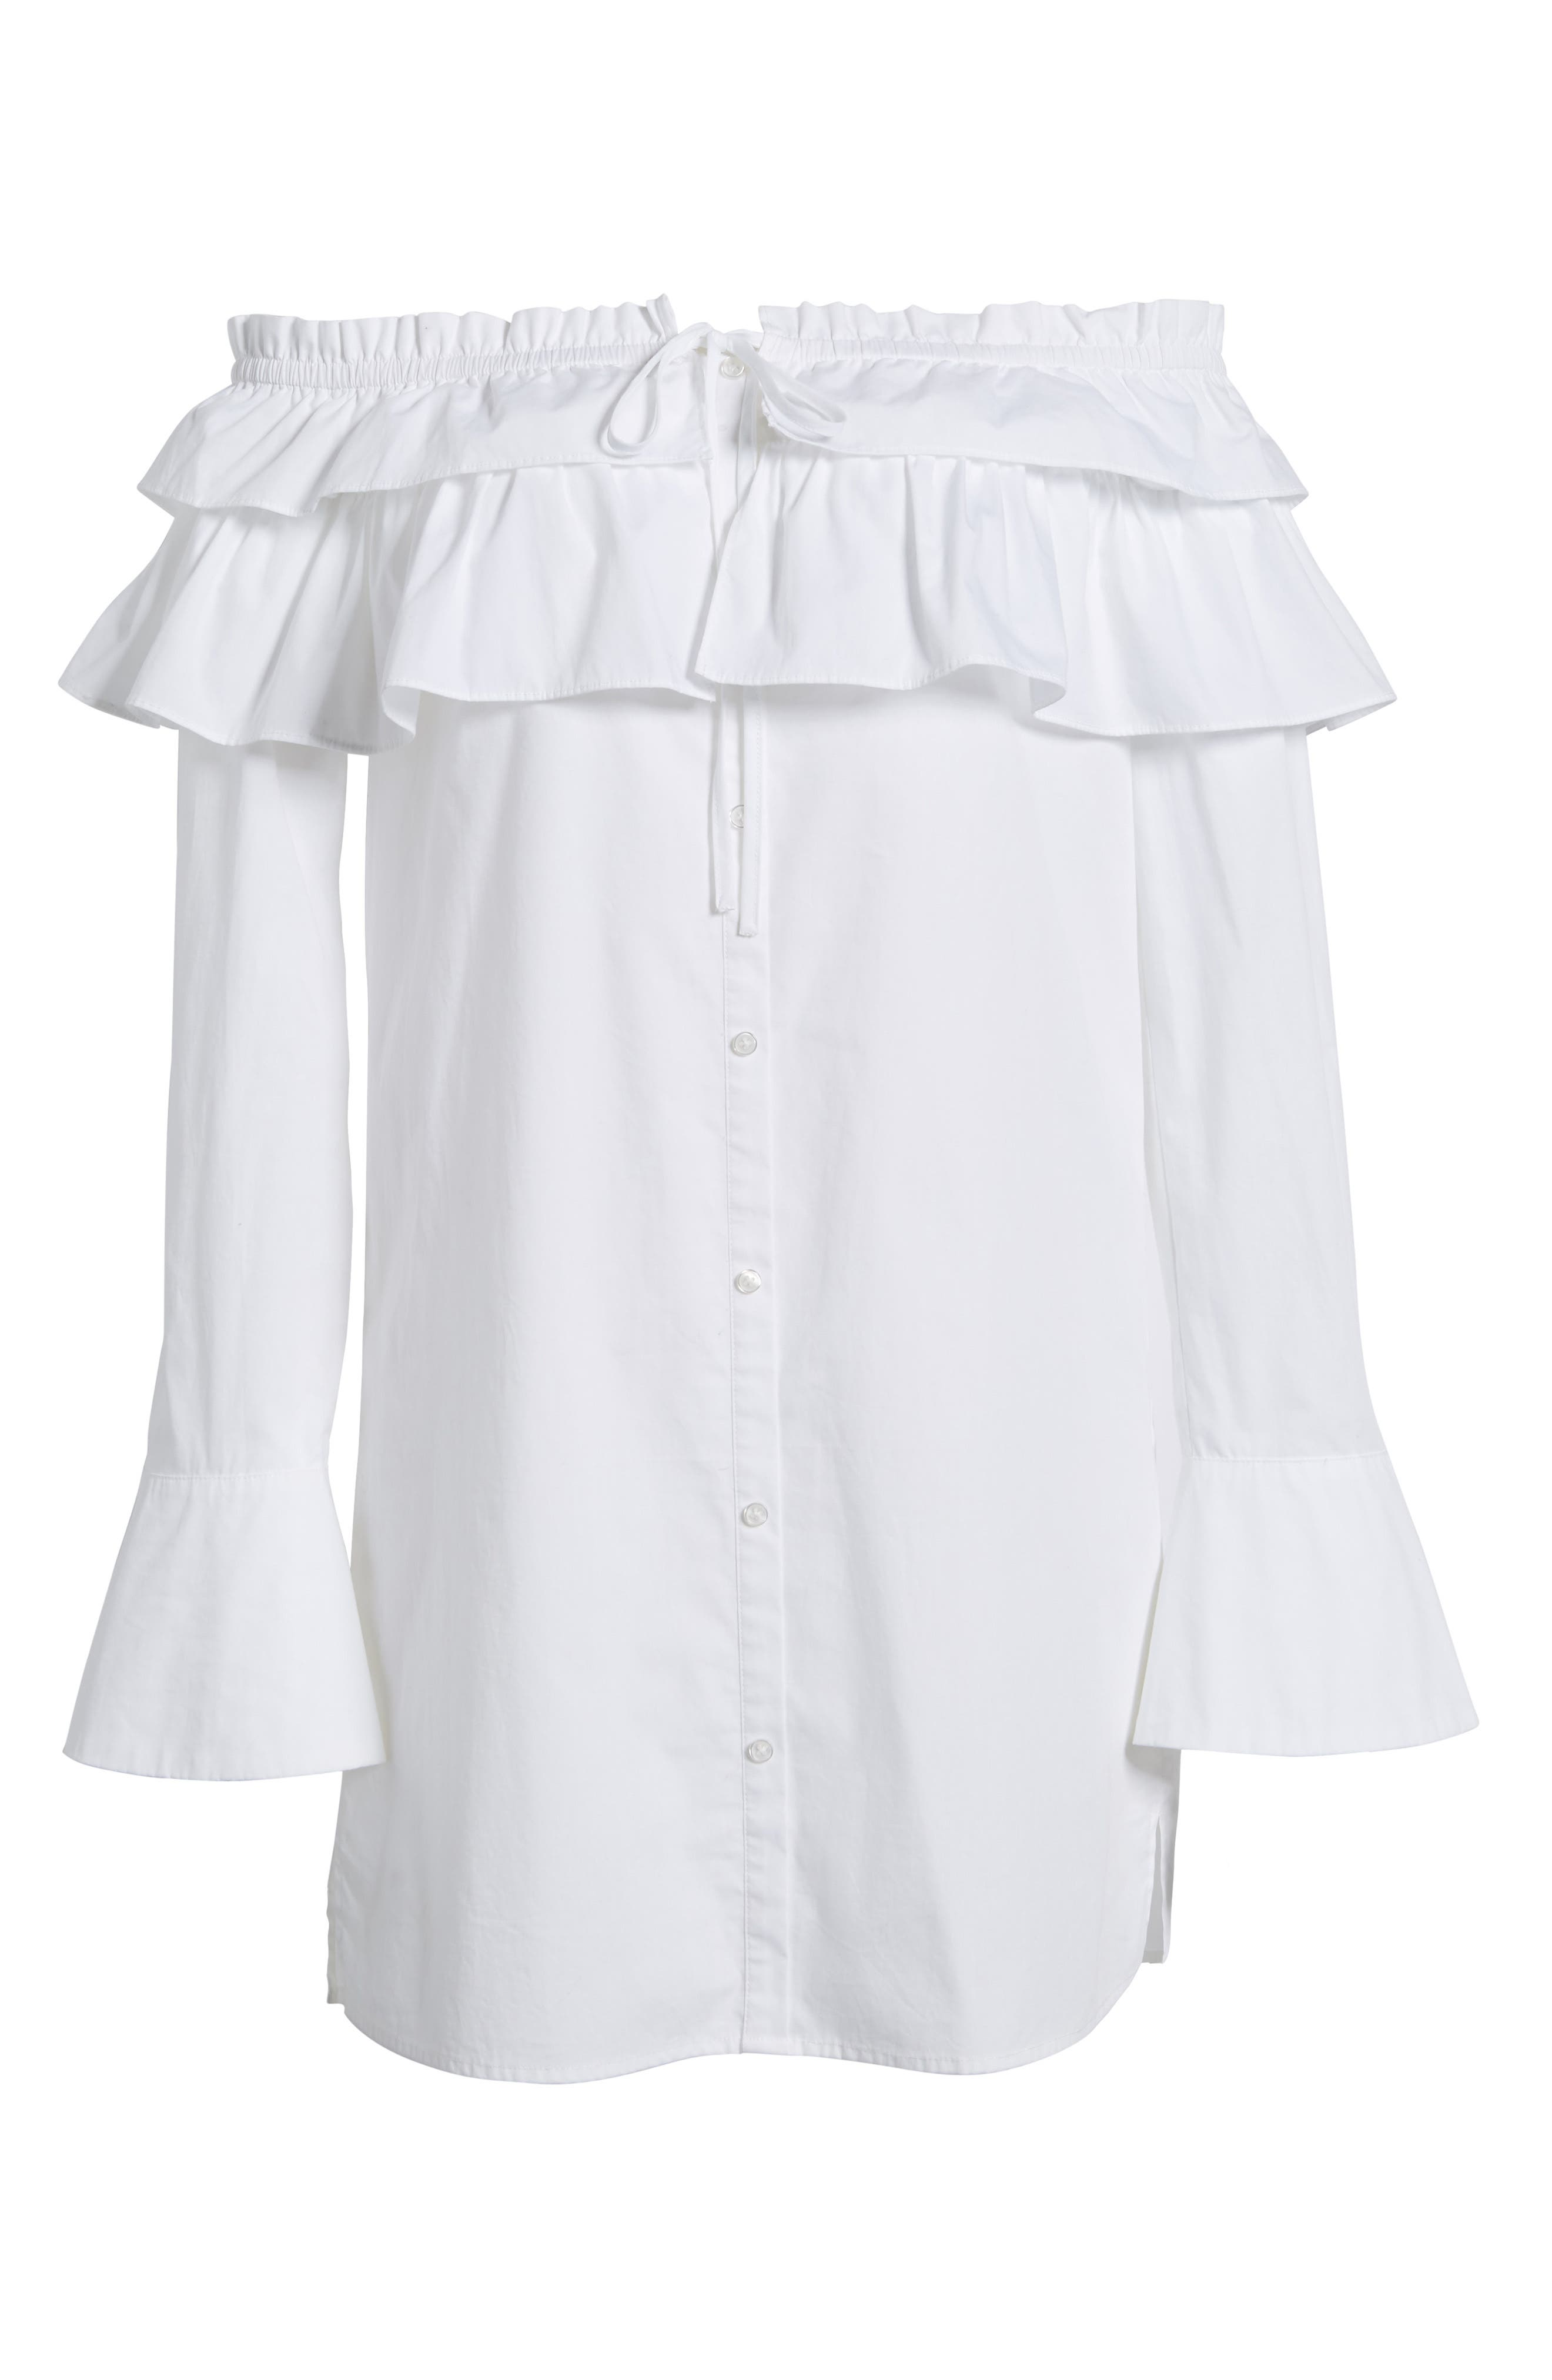 Pallas Off the Shoulder Dress,                             Alternate thumbnail 6, color,                             White